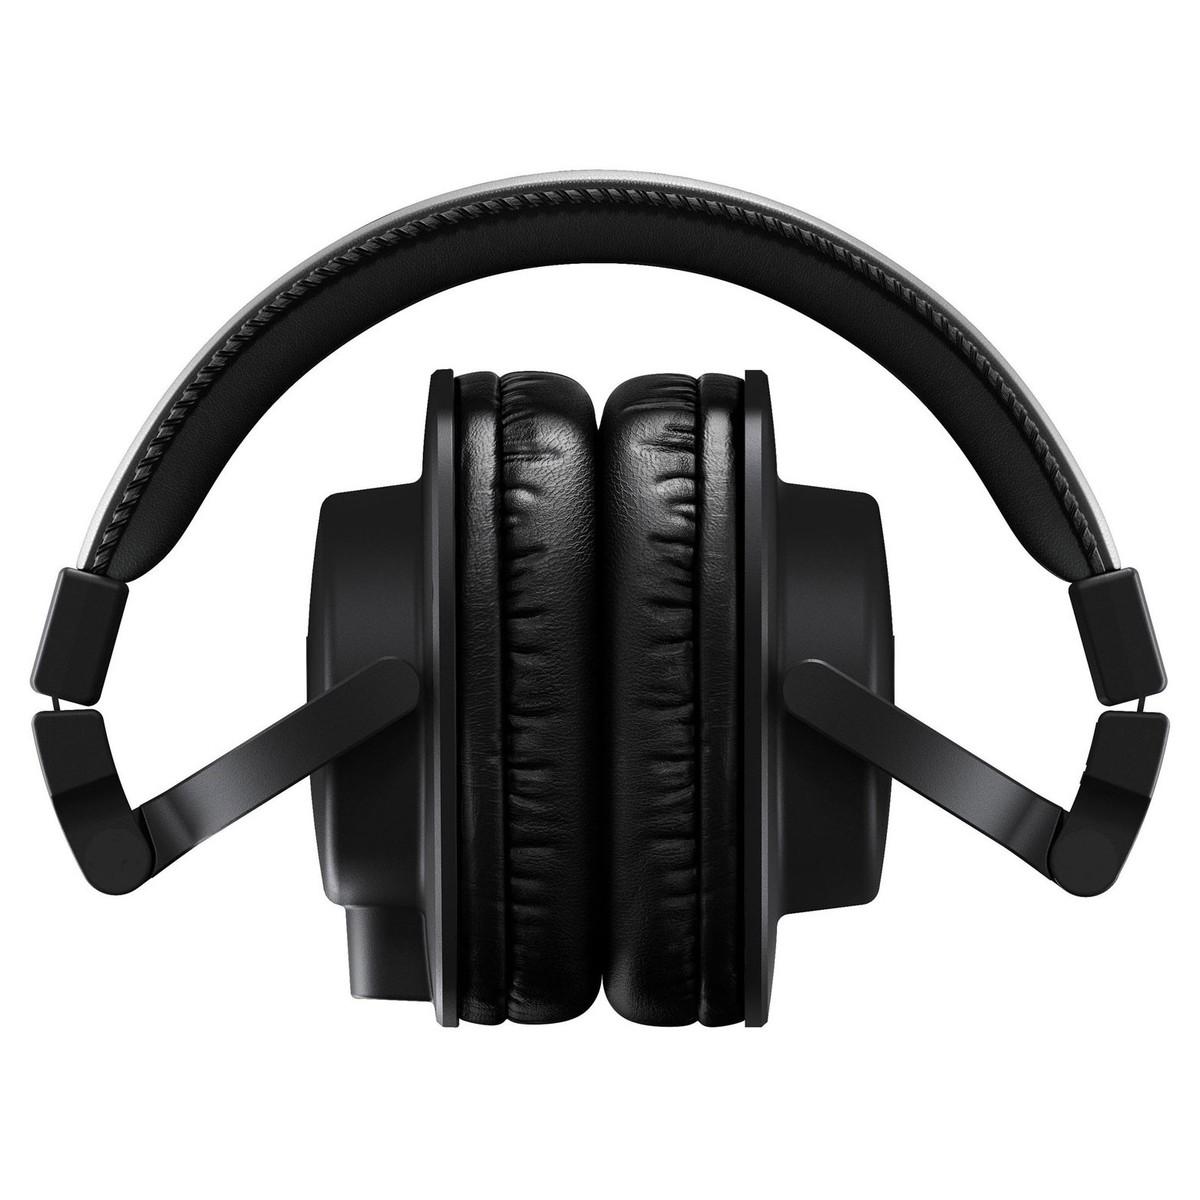 yamaha hph mt5 studio monitor headphones black at. Black Bedroom Furniture Sets. Home Design Ideas